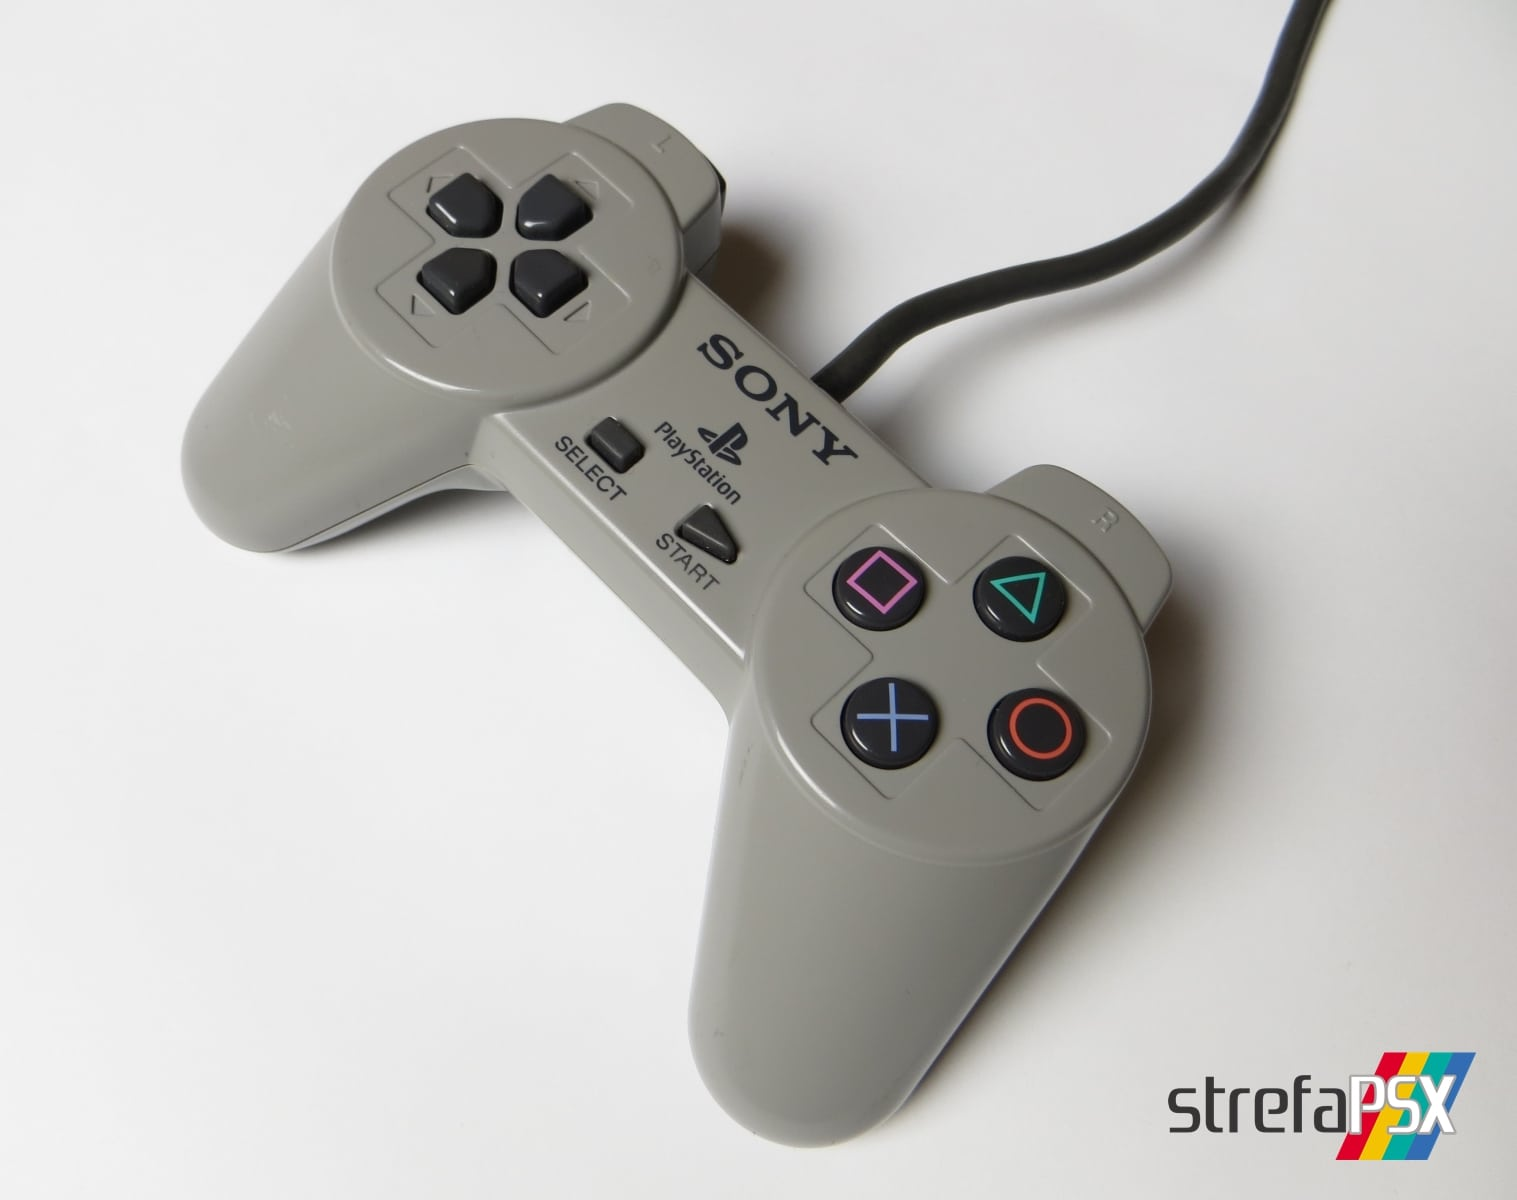 playstation controller scph 1010 3 - 20 ciekawostek o PlayStation na 20lecie marki